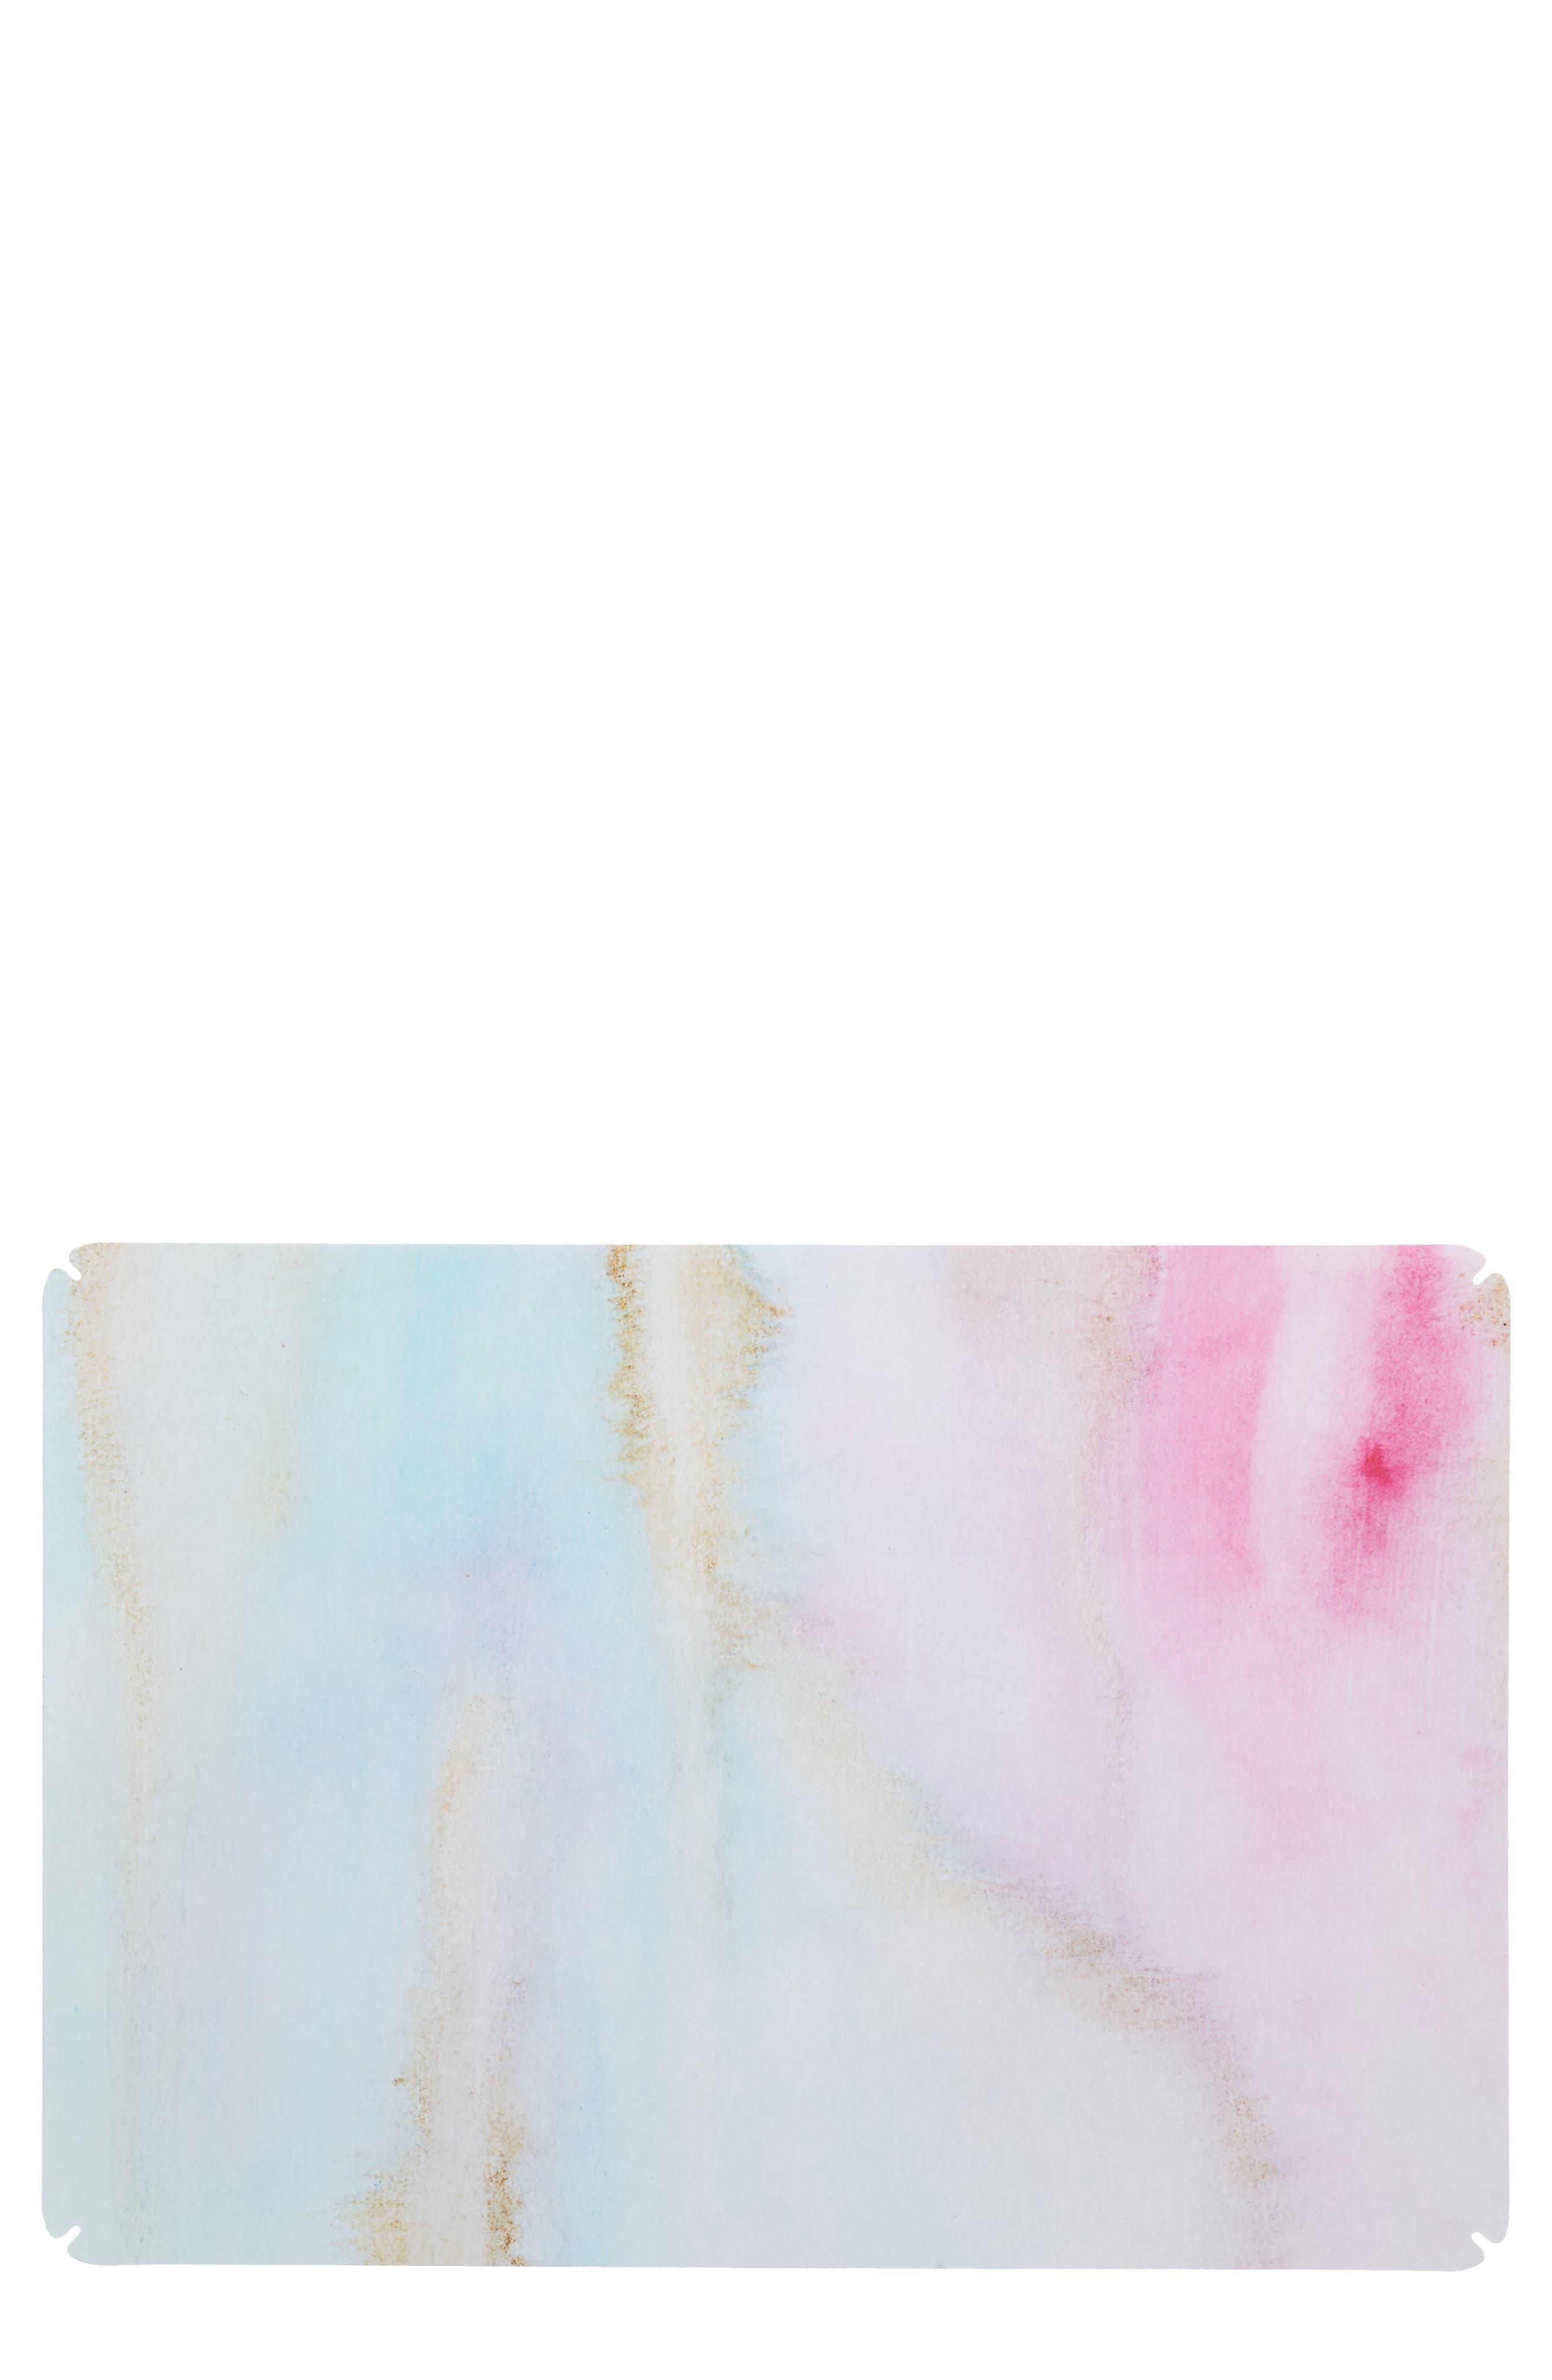 Watercolor Marble 13-Inch Macbook Skin,                         Main,                         color, 650